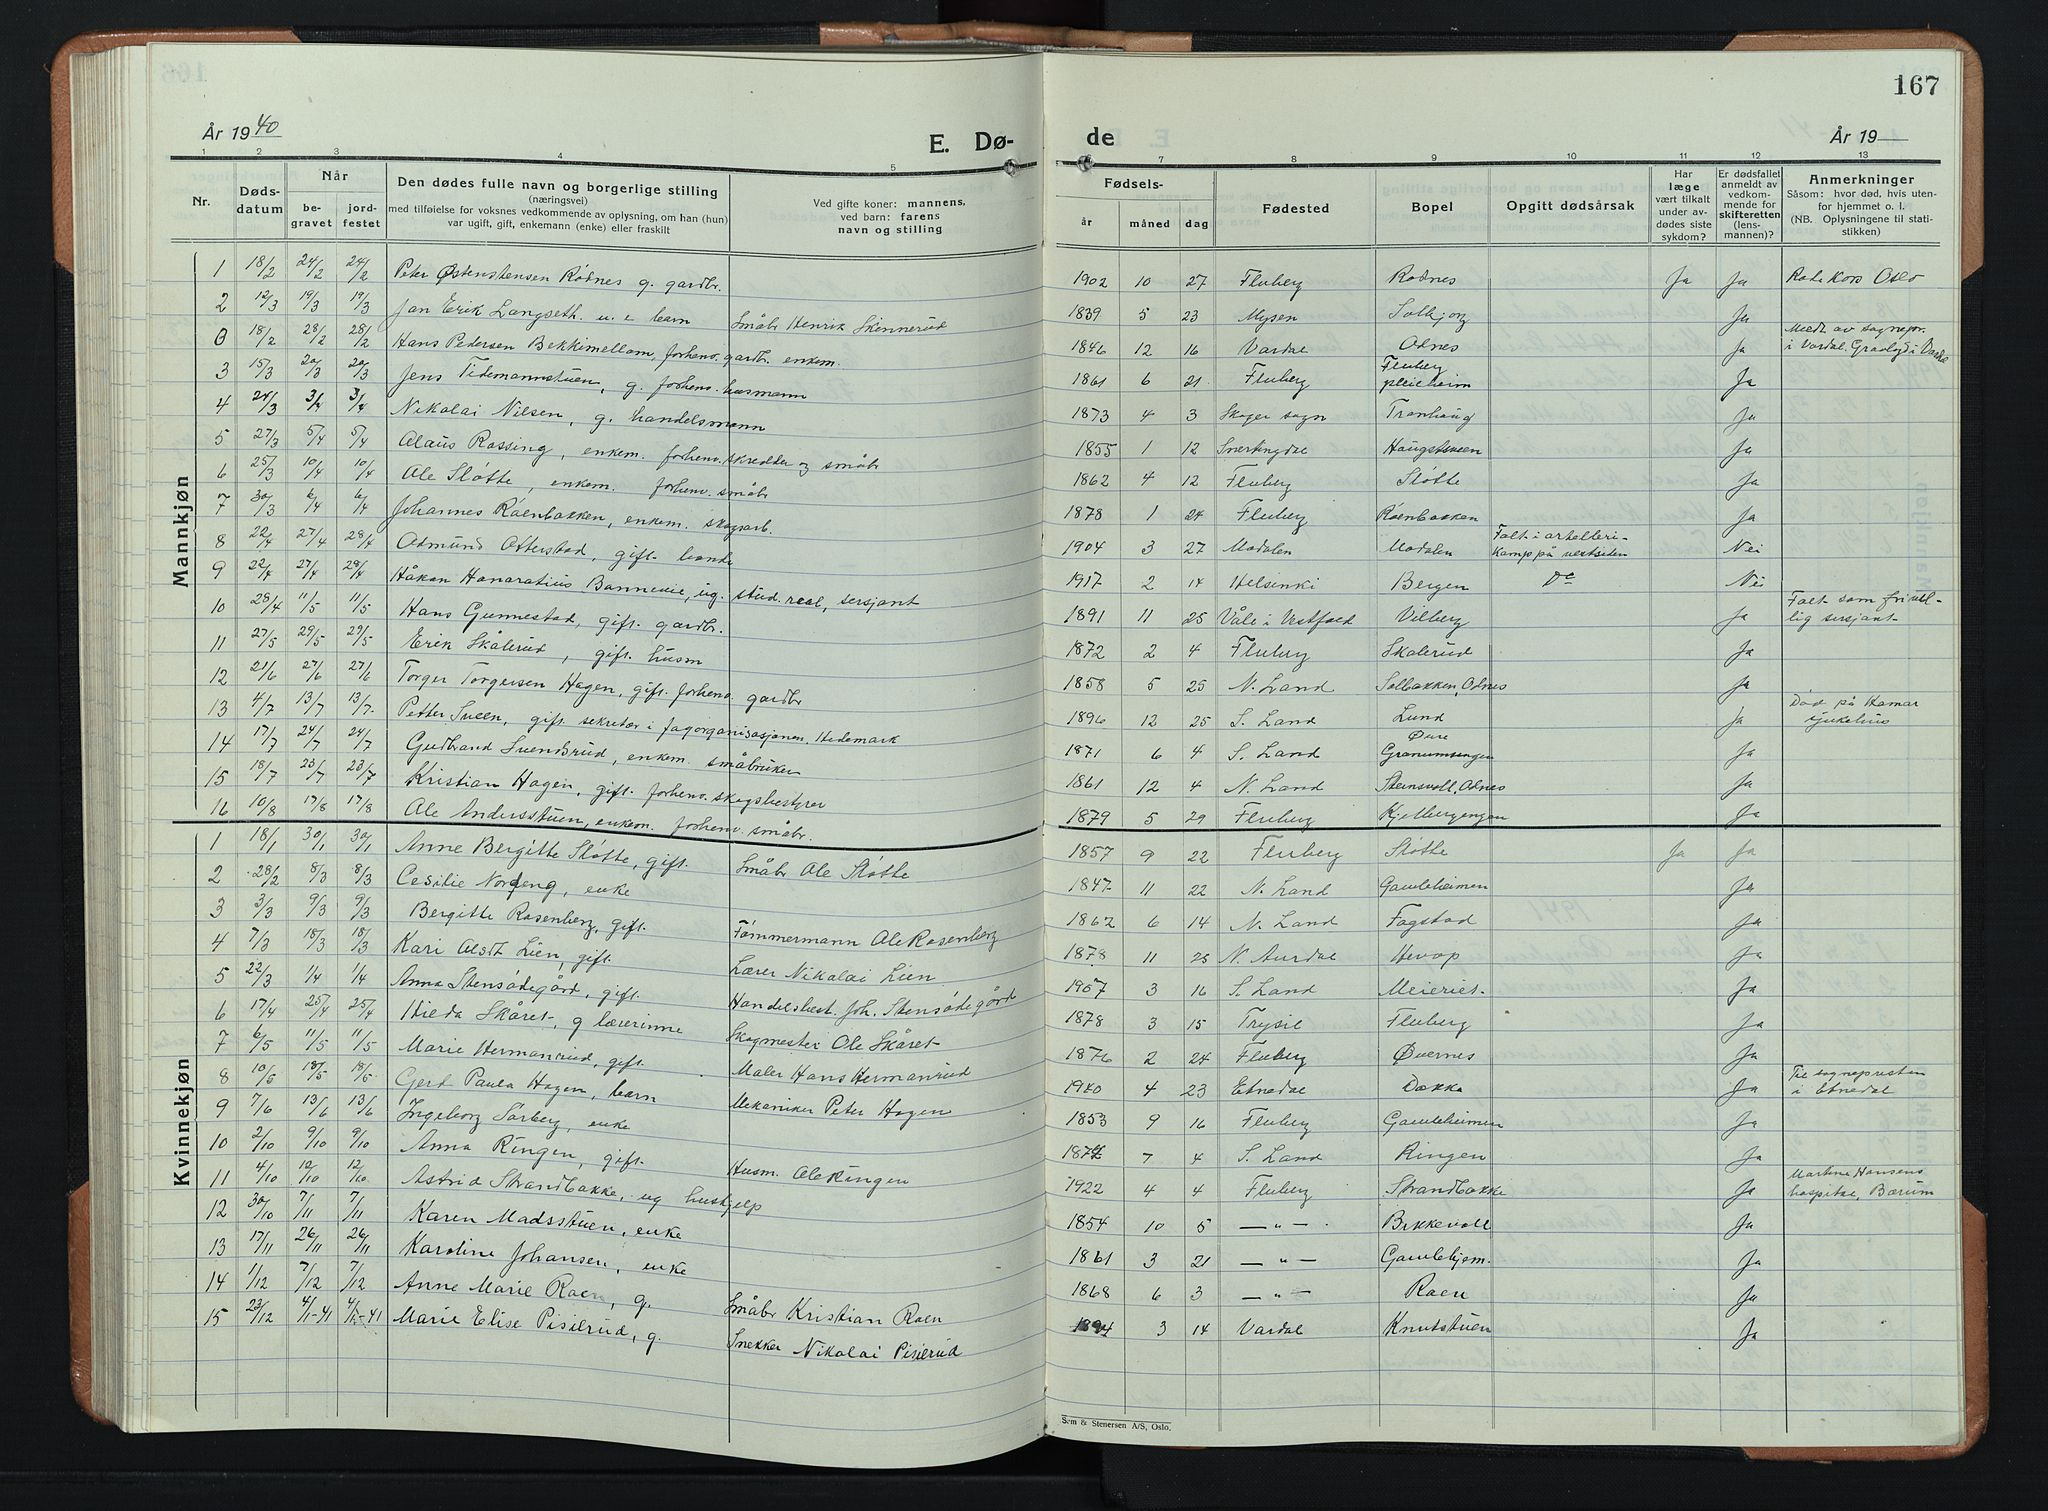 SAH, Søndre Land prestekontor, L/L0008: Klokkerbok nr. 8, 1926-1950, s. 167